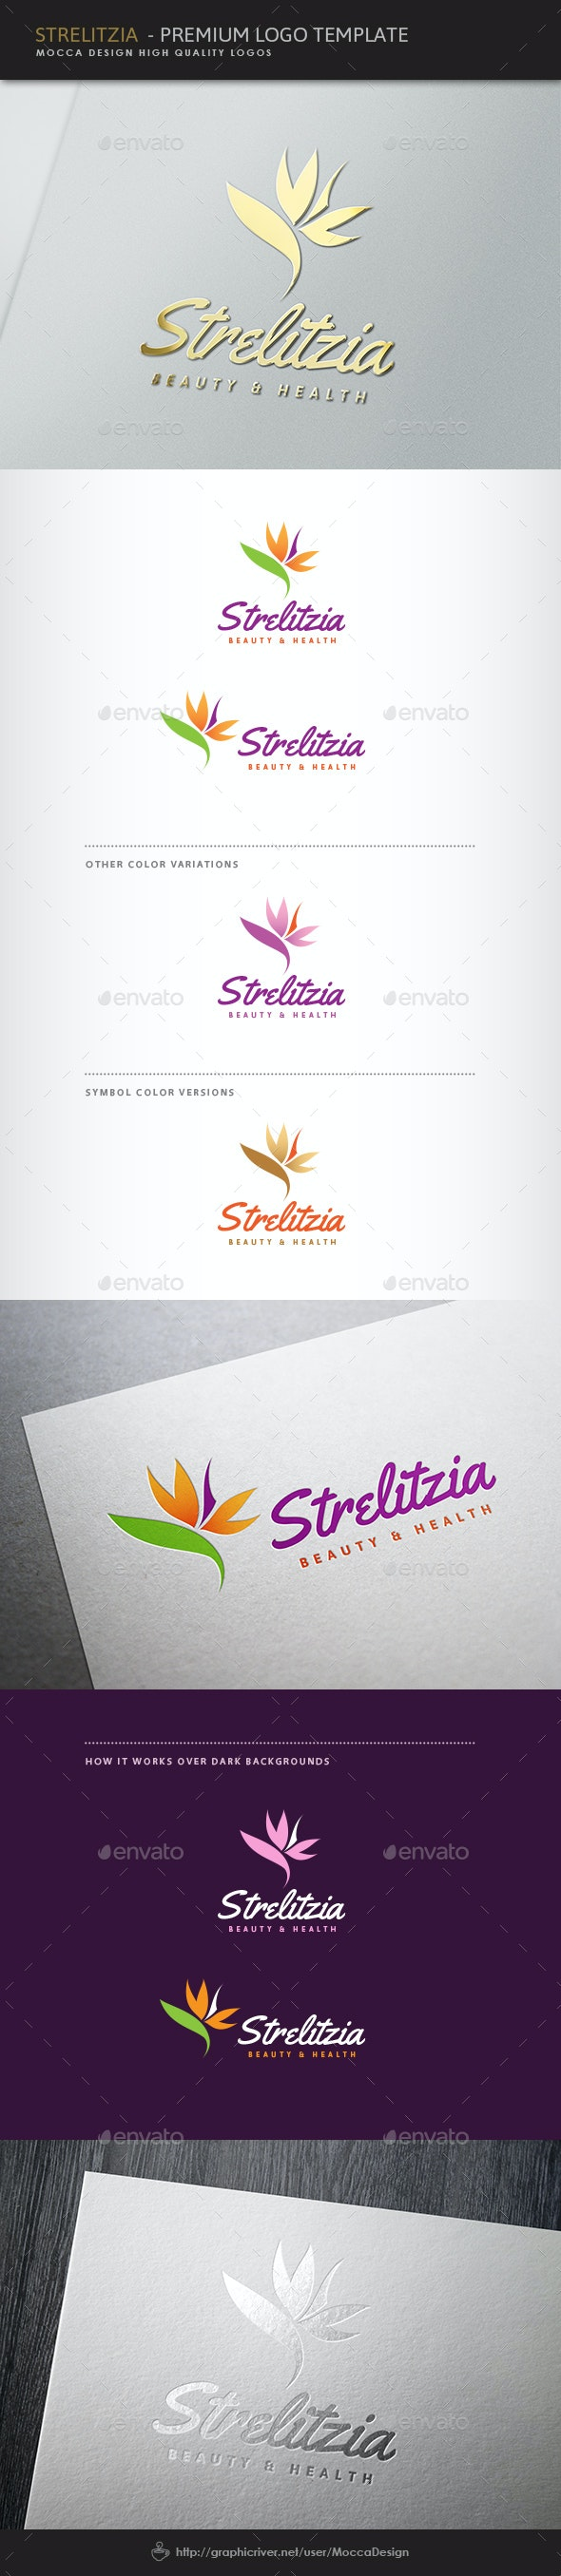 Strelitzia Logo - Nature Logo Templates